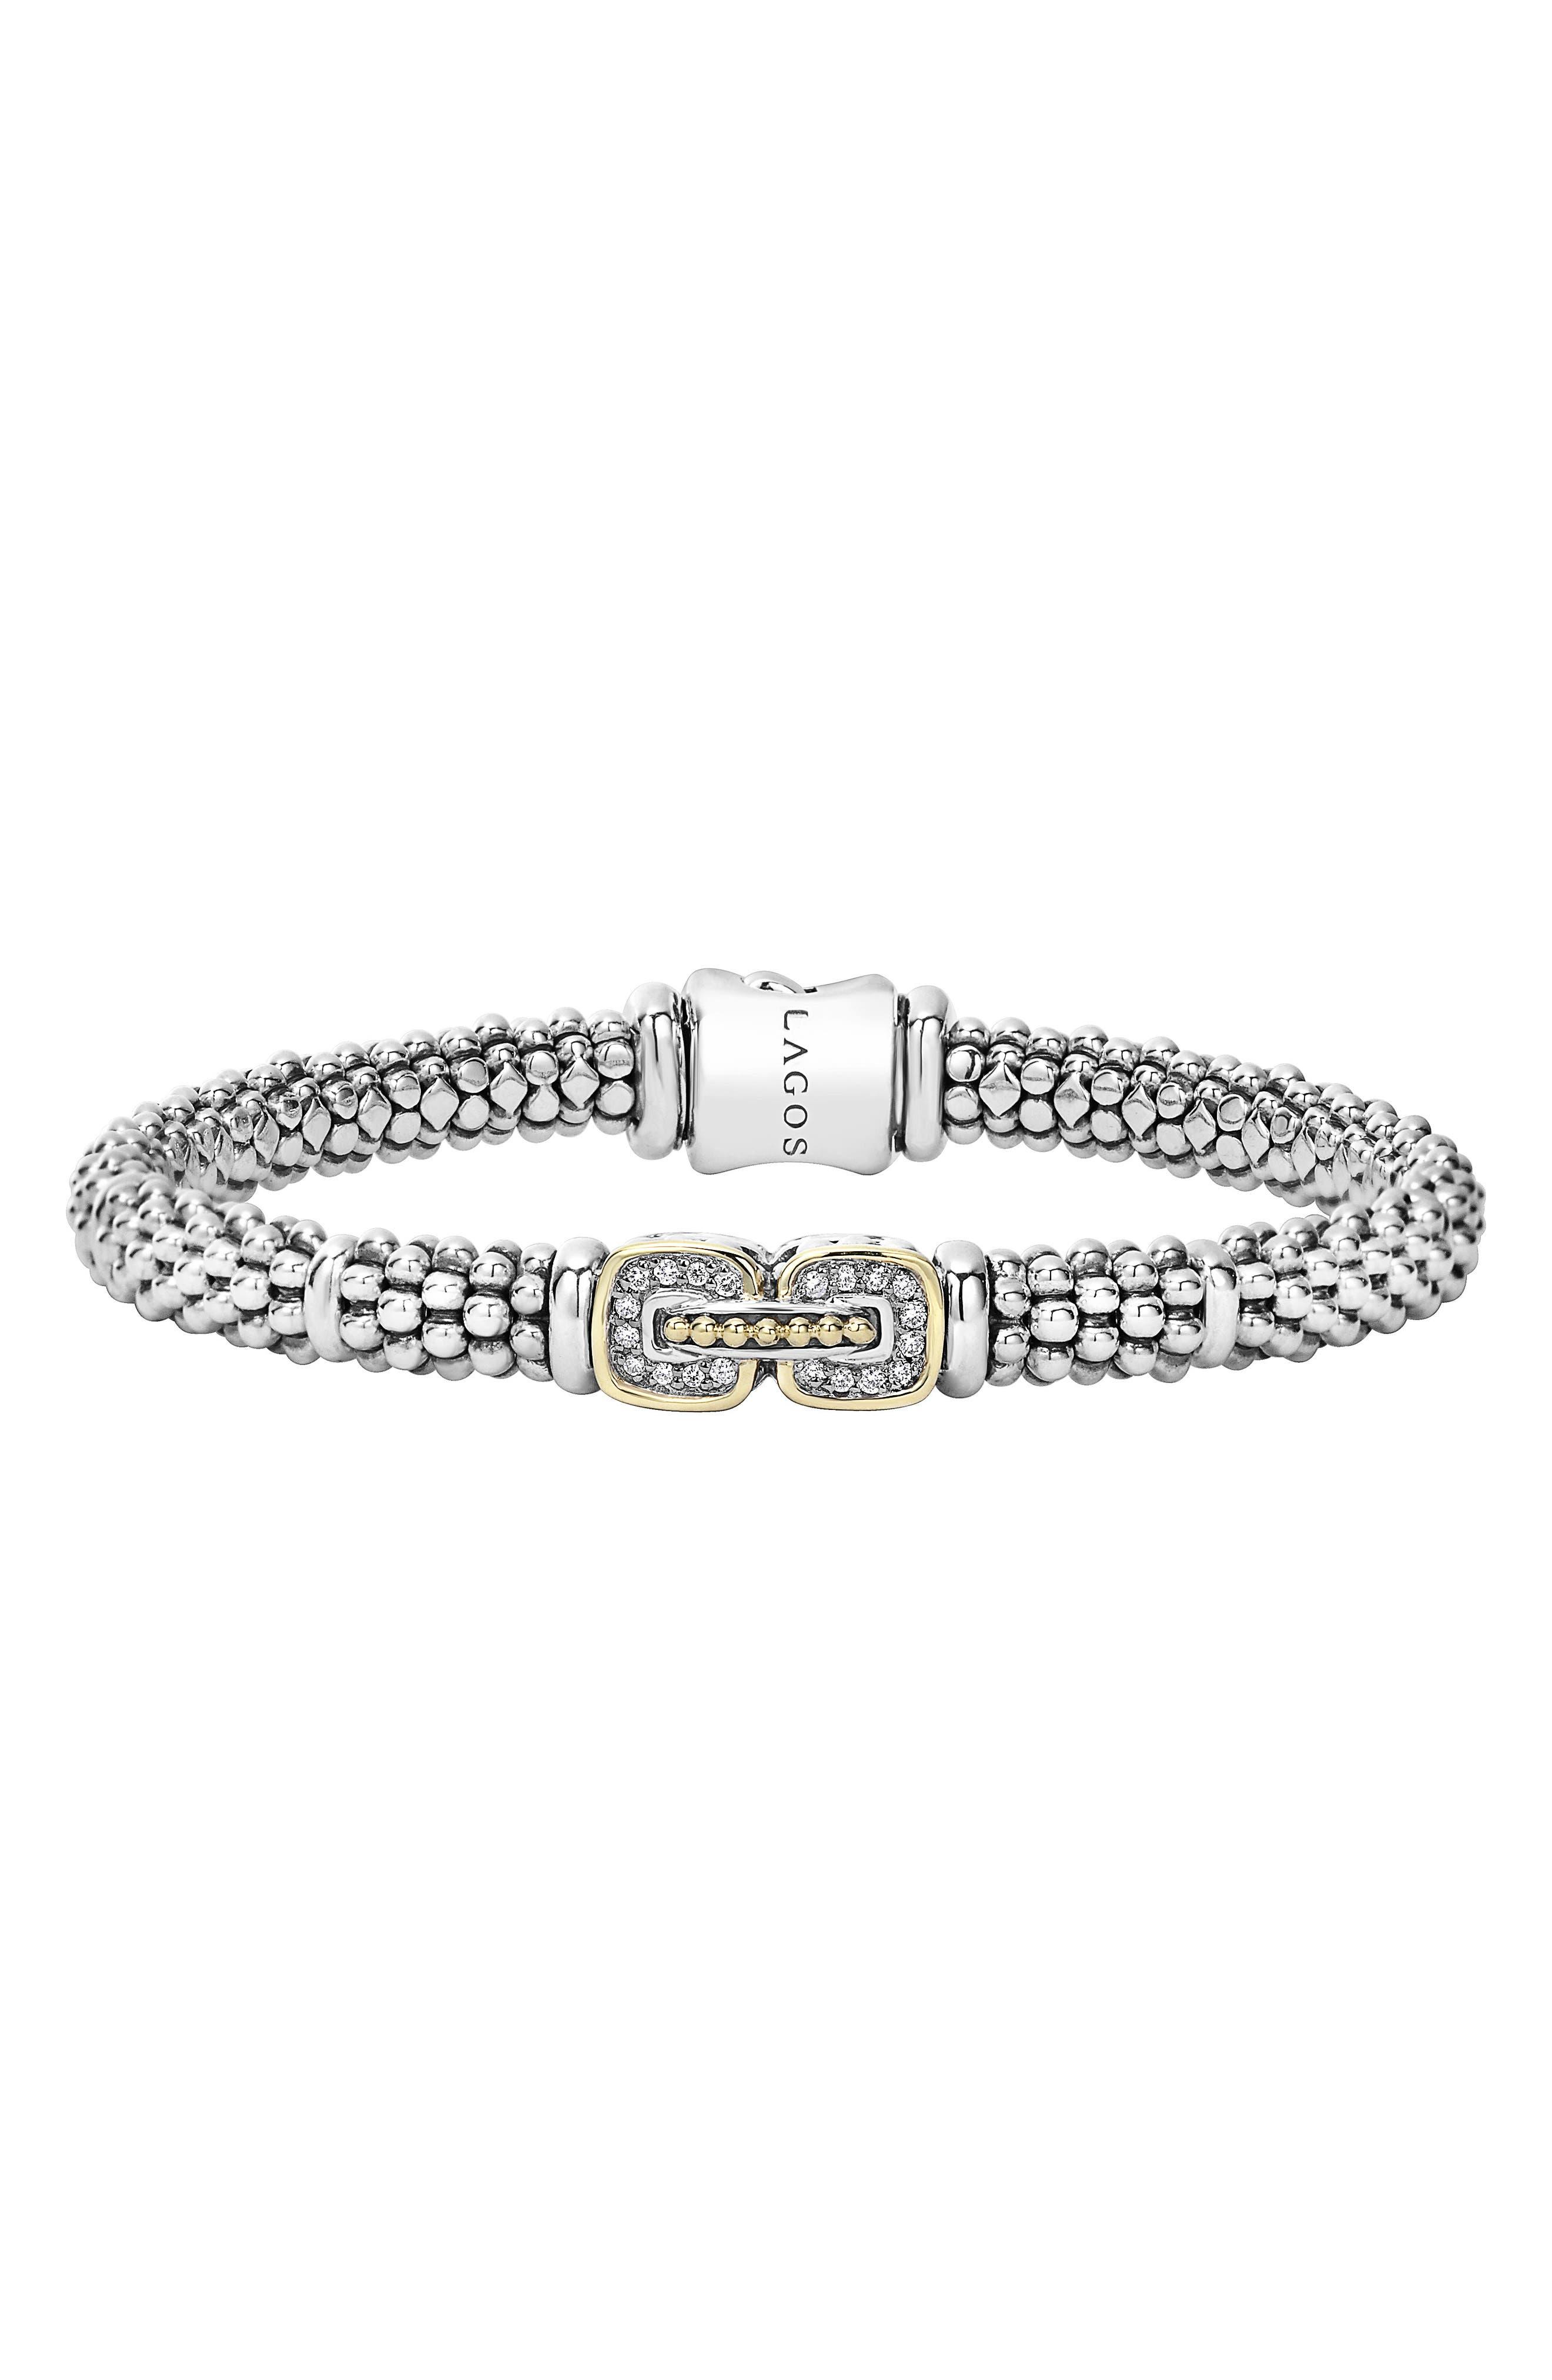 Caviar Cushion Diamond Station Bracelet,                         Main,                         color, SILVER/ GOLD